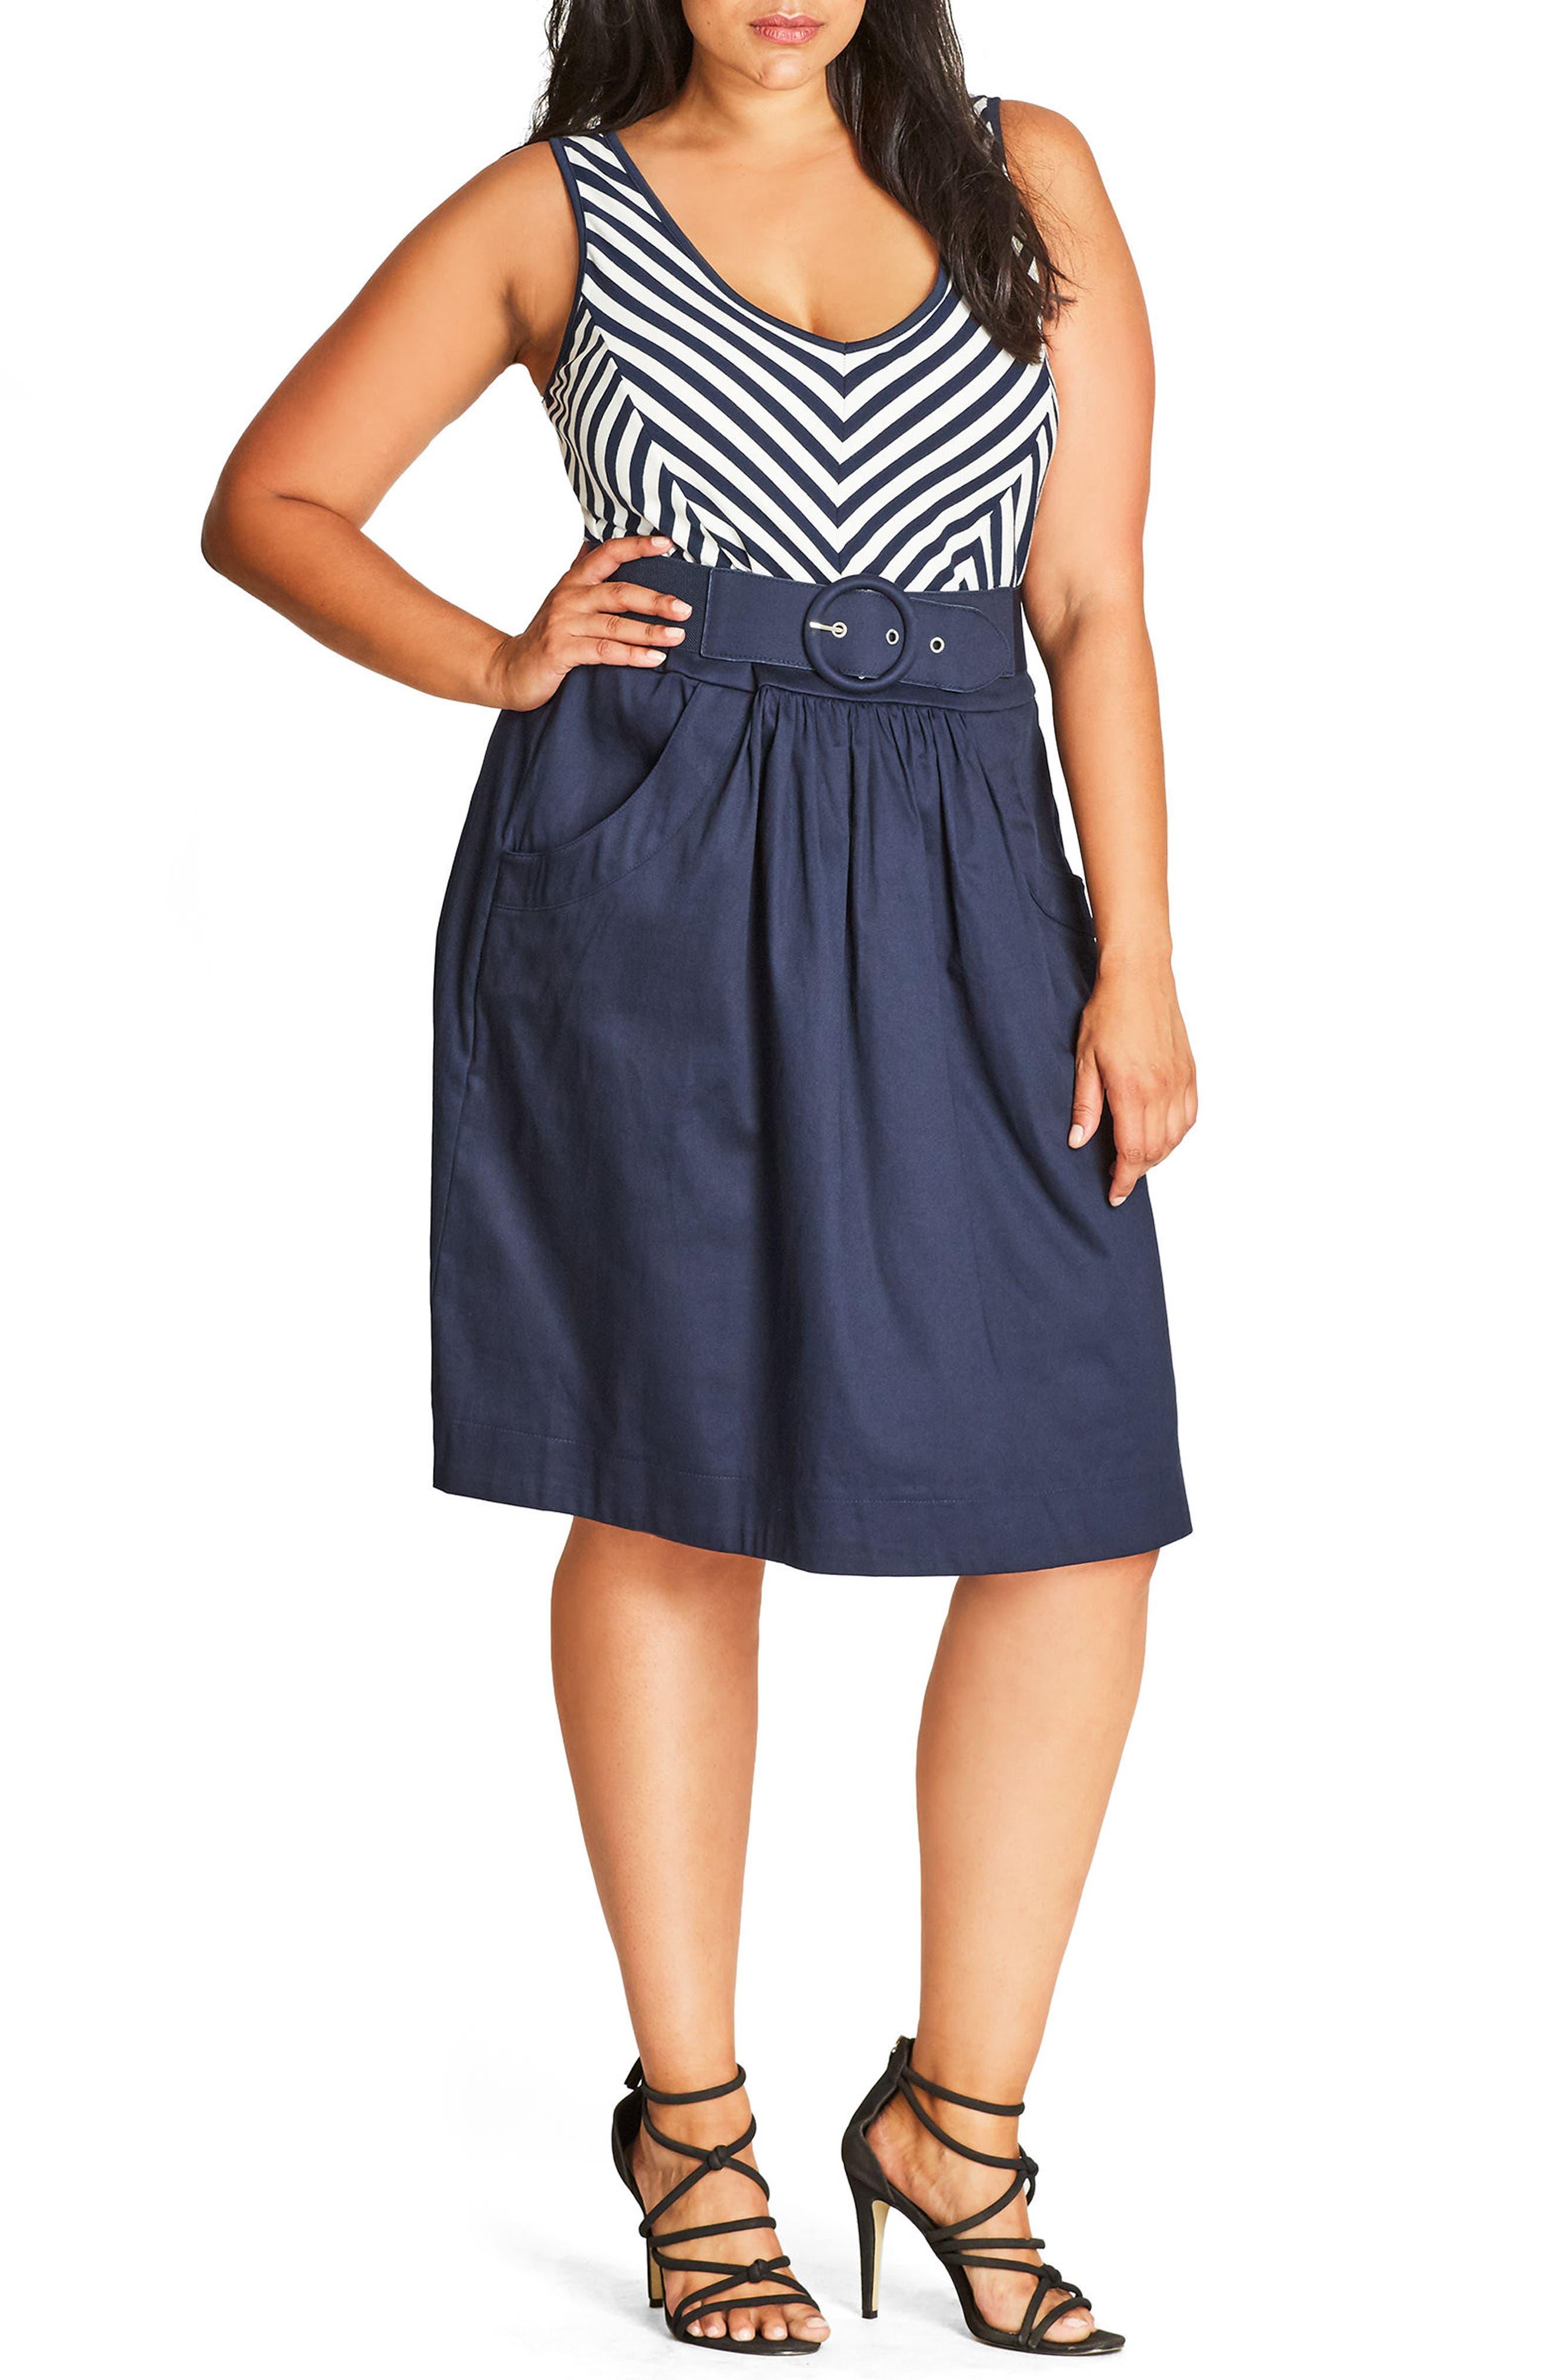 Plus Size City Chic Ahoy Sailor Belted Fit & Flare Dress